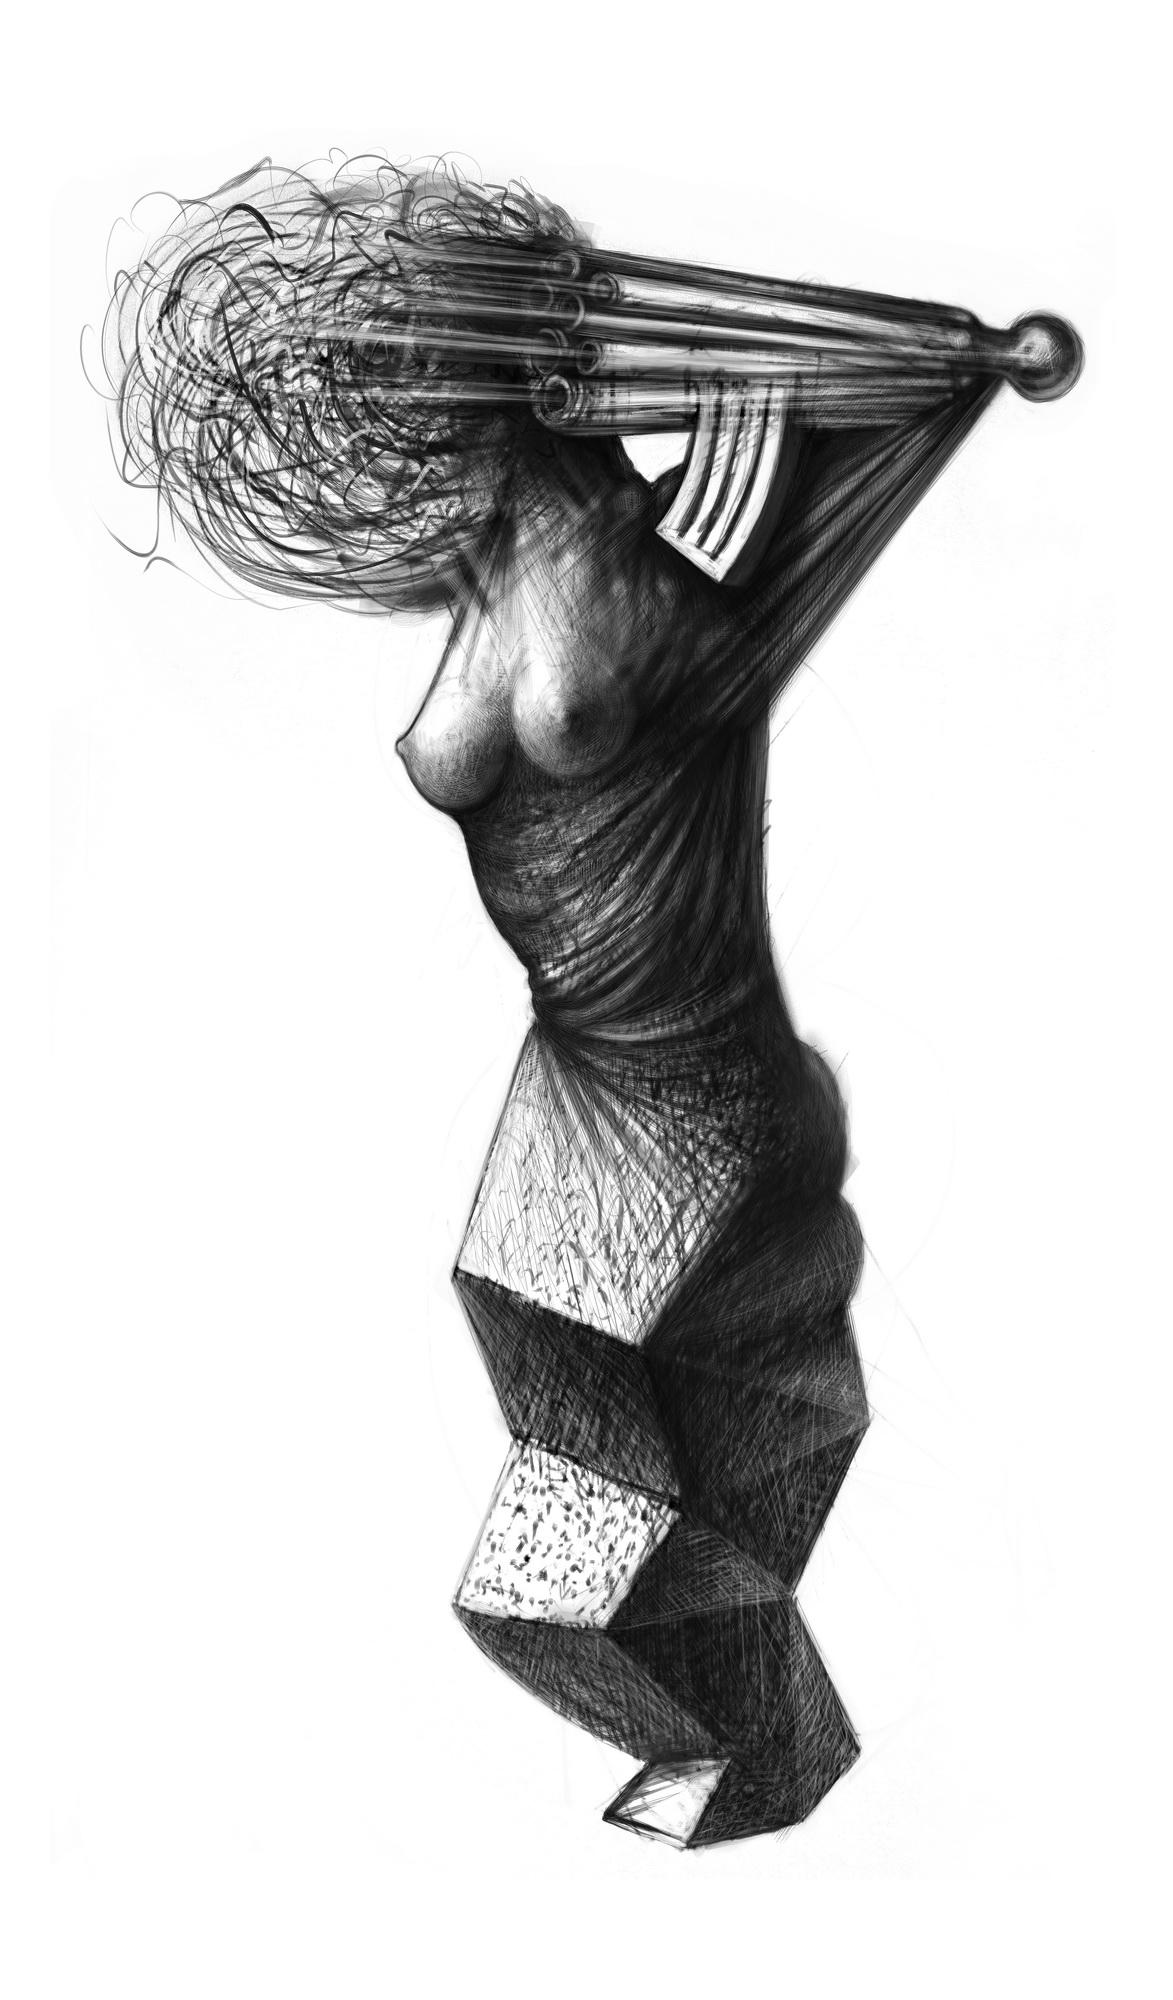 Cubist woman with calashnikov